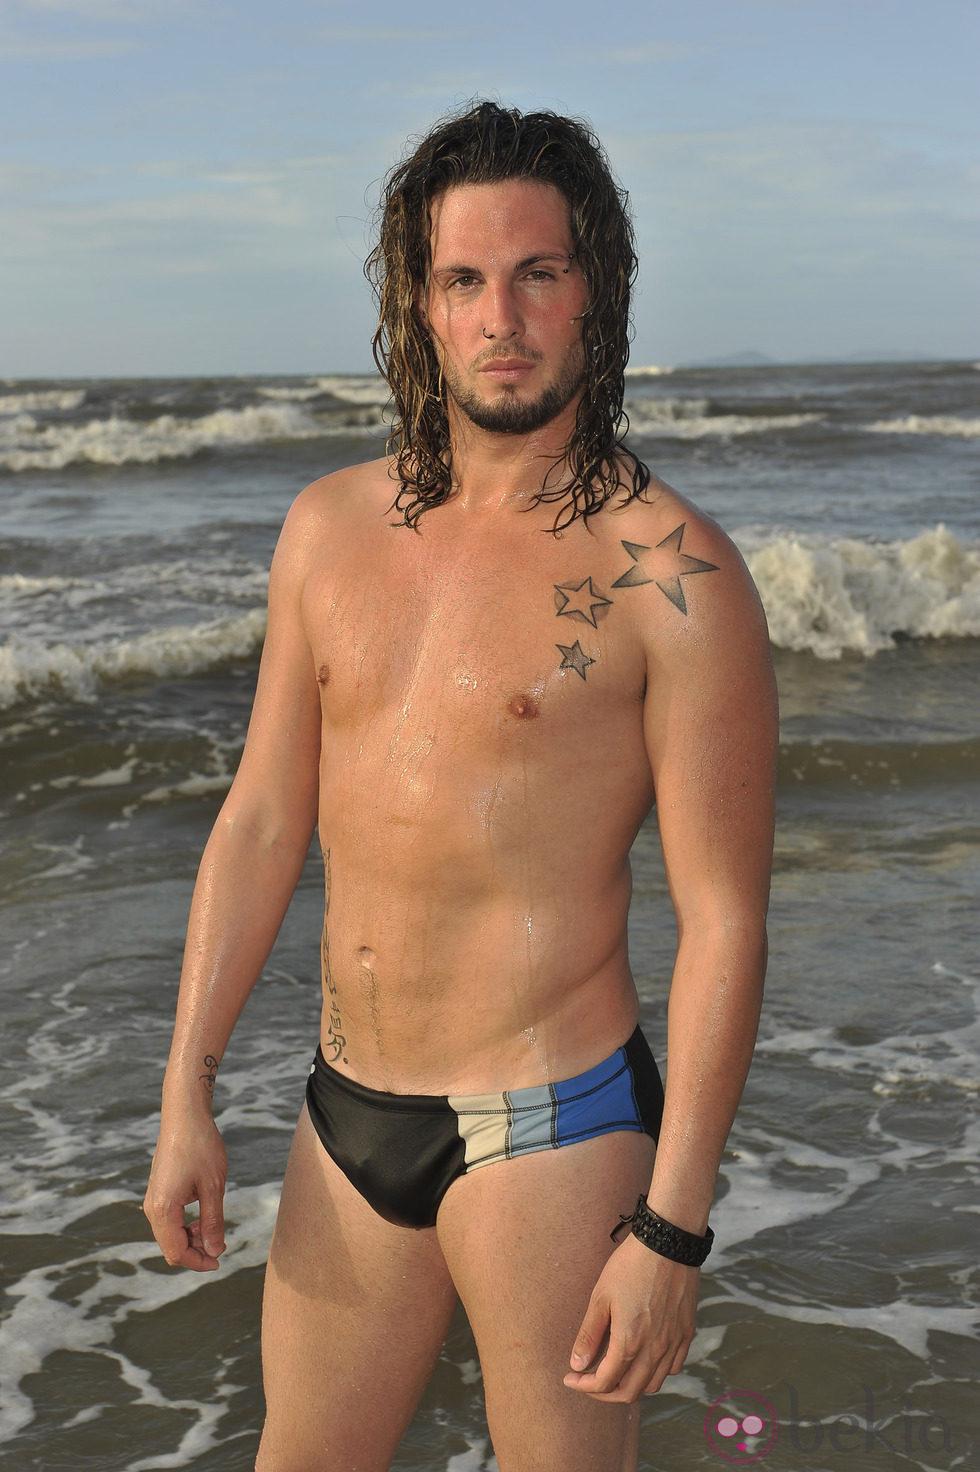 Rosi en la playa de la tejita masturbandome para un miron - 3 part 7